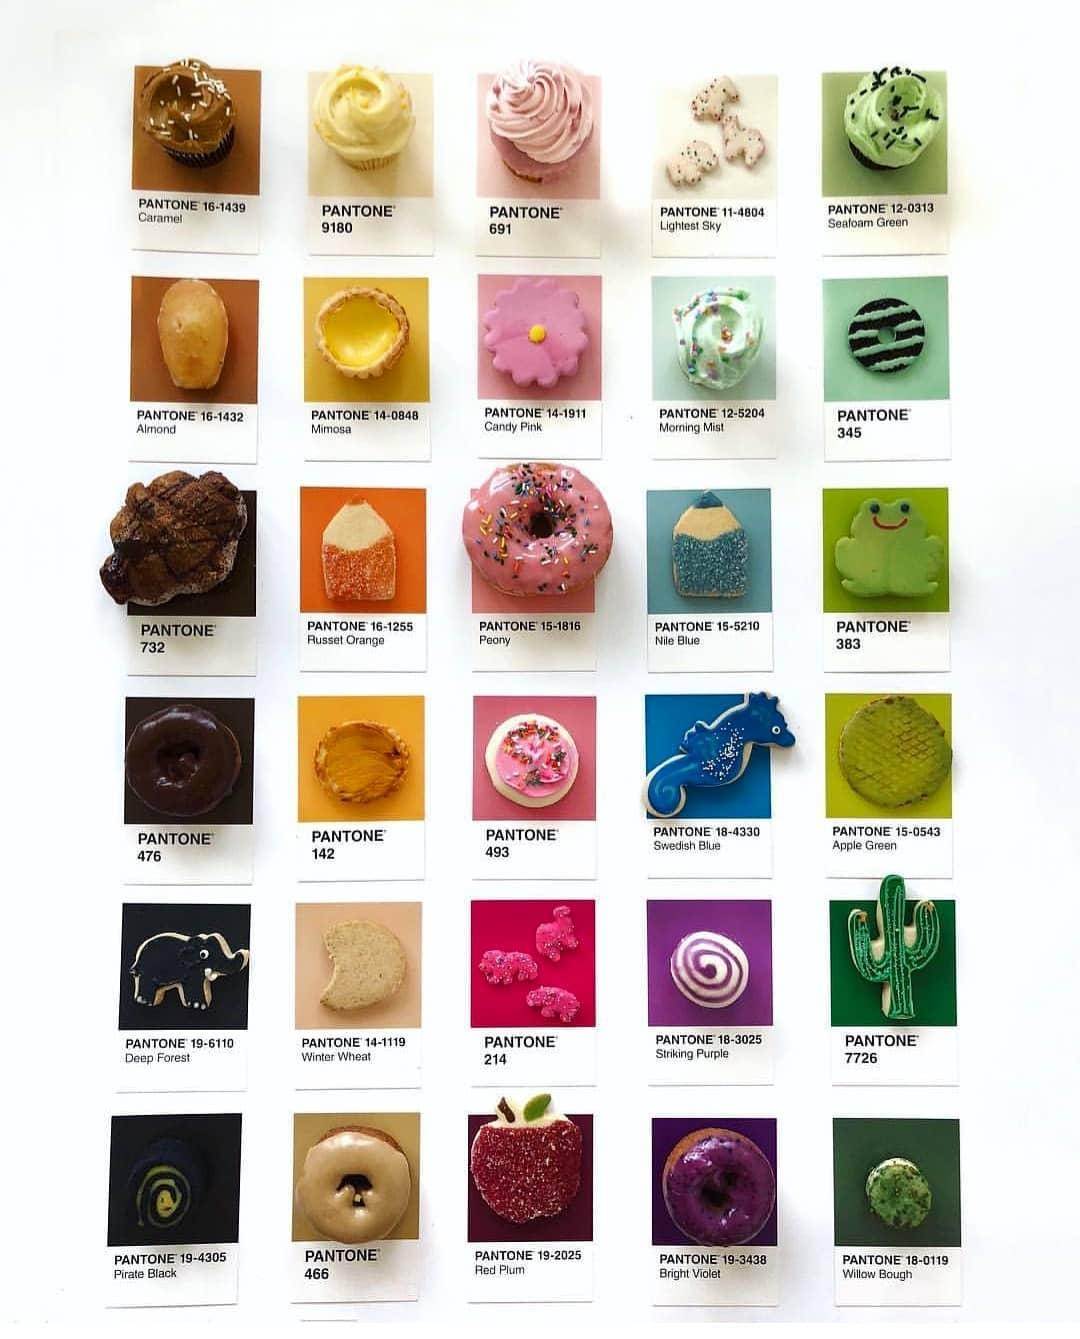 lucy litman Lucy Litman's Pantone 'Pairing' Food Cards Lucy Litman 5